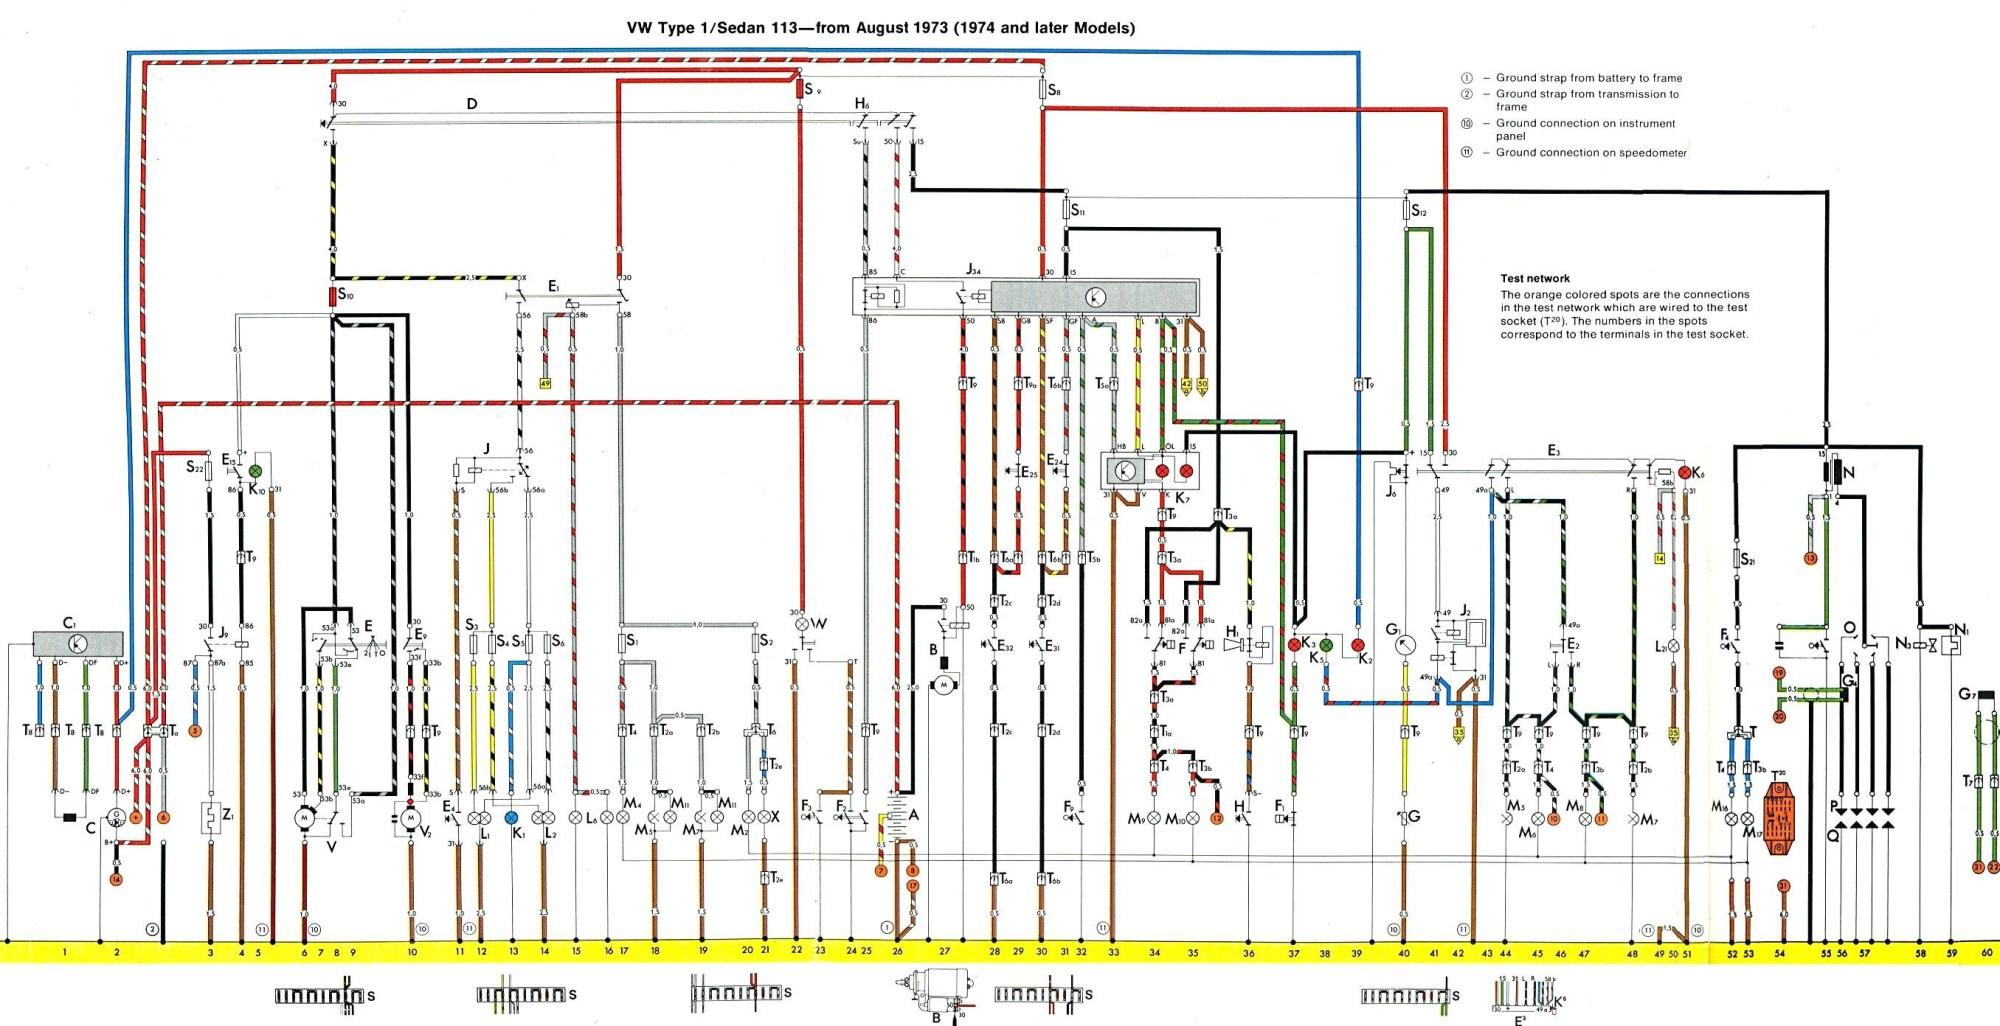 hight resolution of 74 vw bug alternator wiring as well as vw beetle engine tin diagrambug alternator wiring diagram